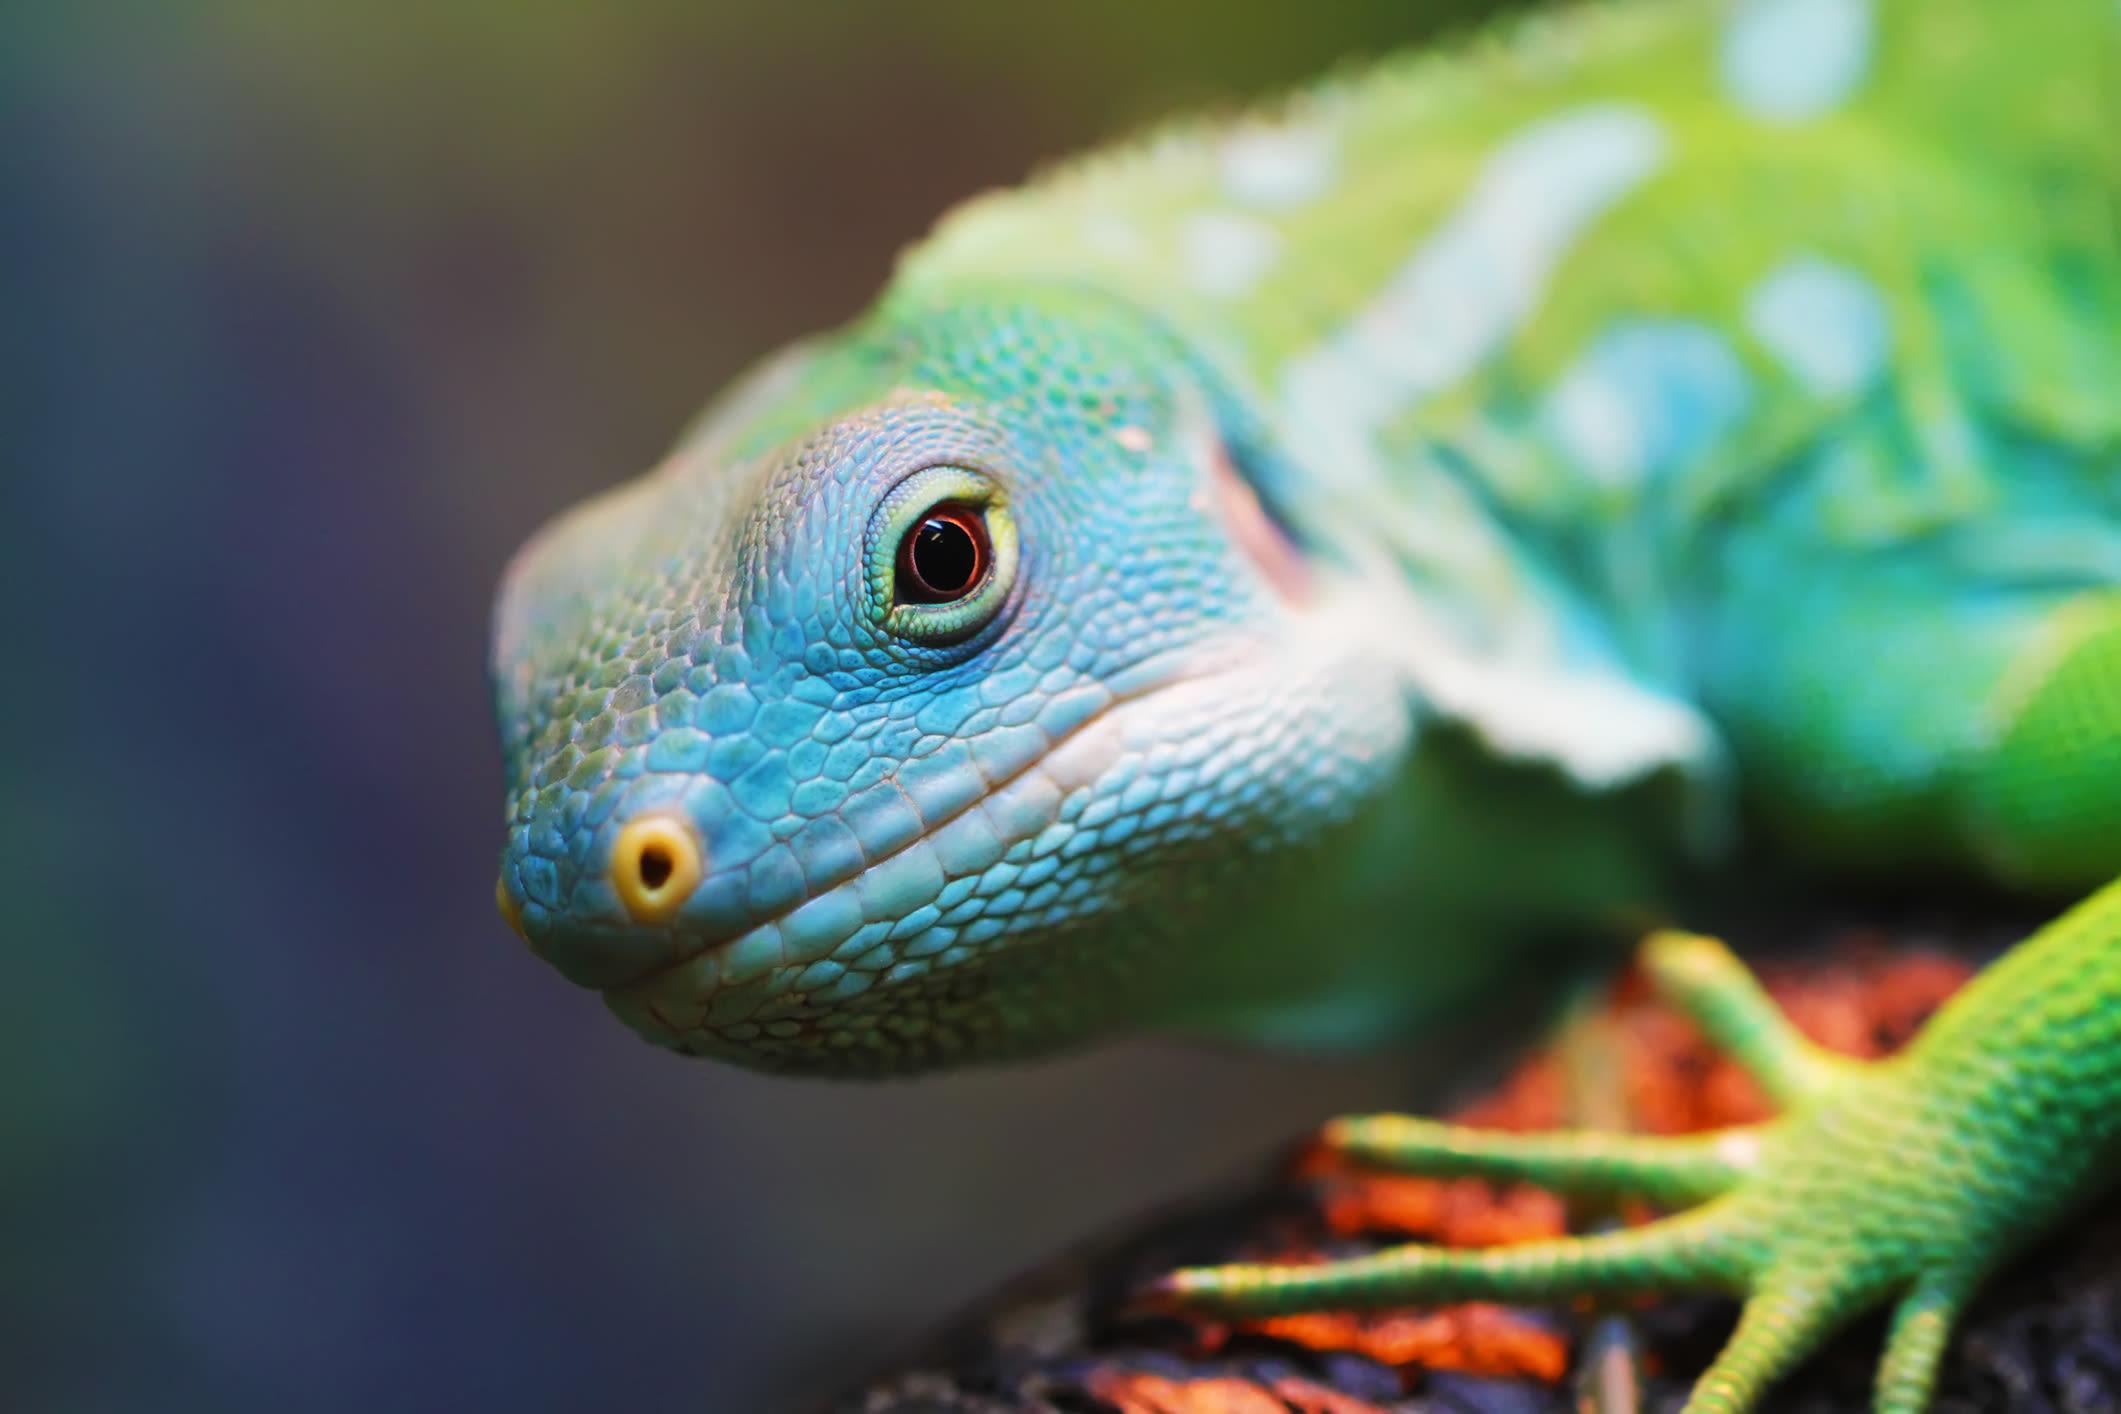 Exotic reptile at Black Forest Veterinary Clinic in Colorado Springs, Colorado